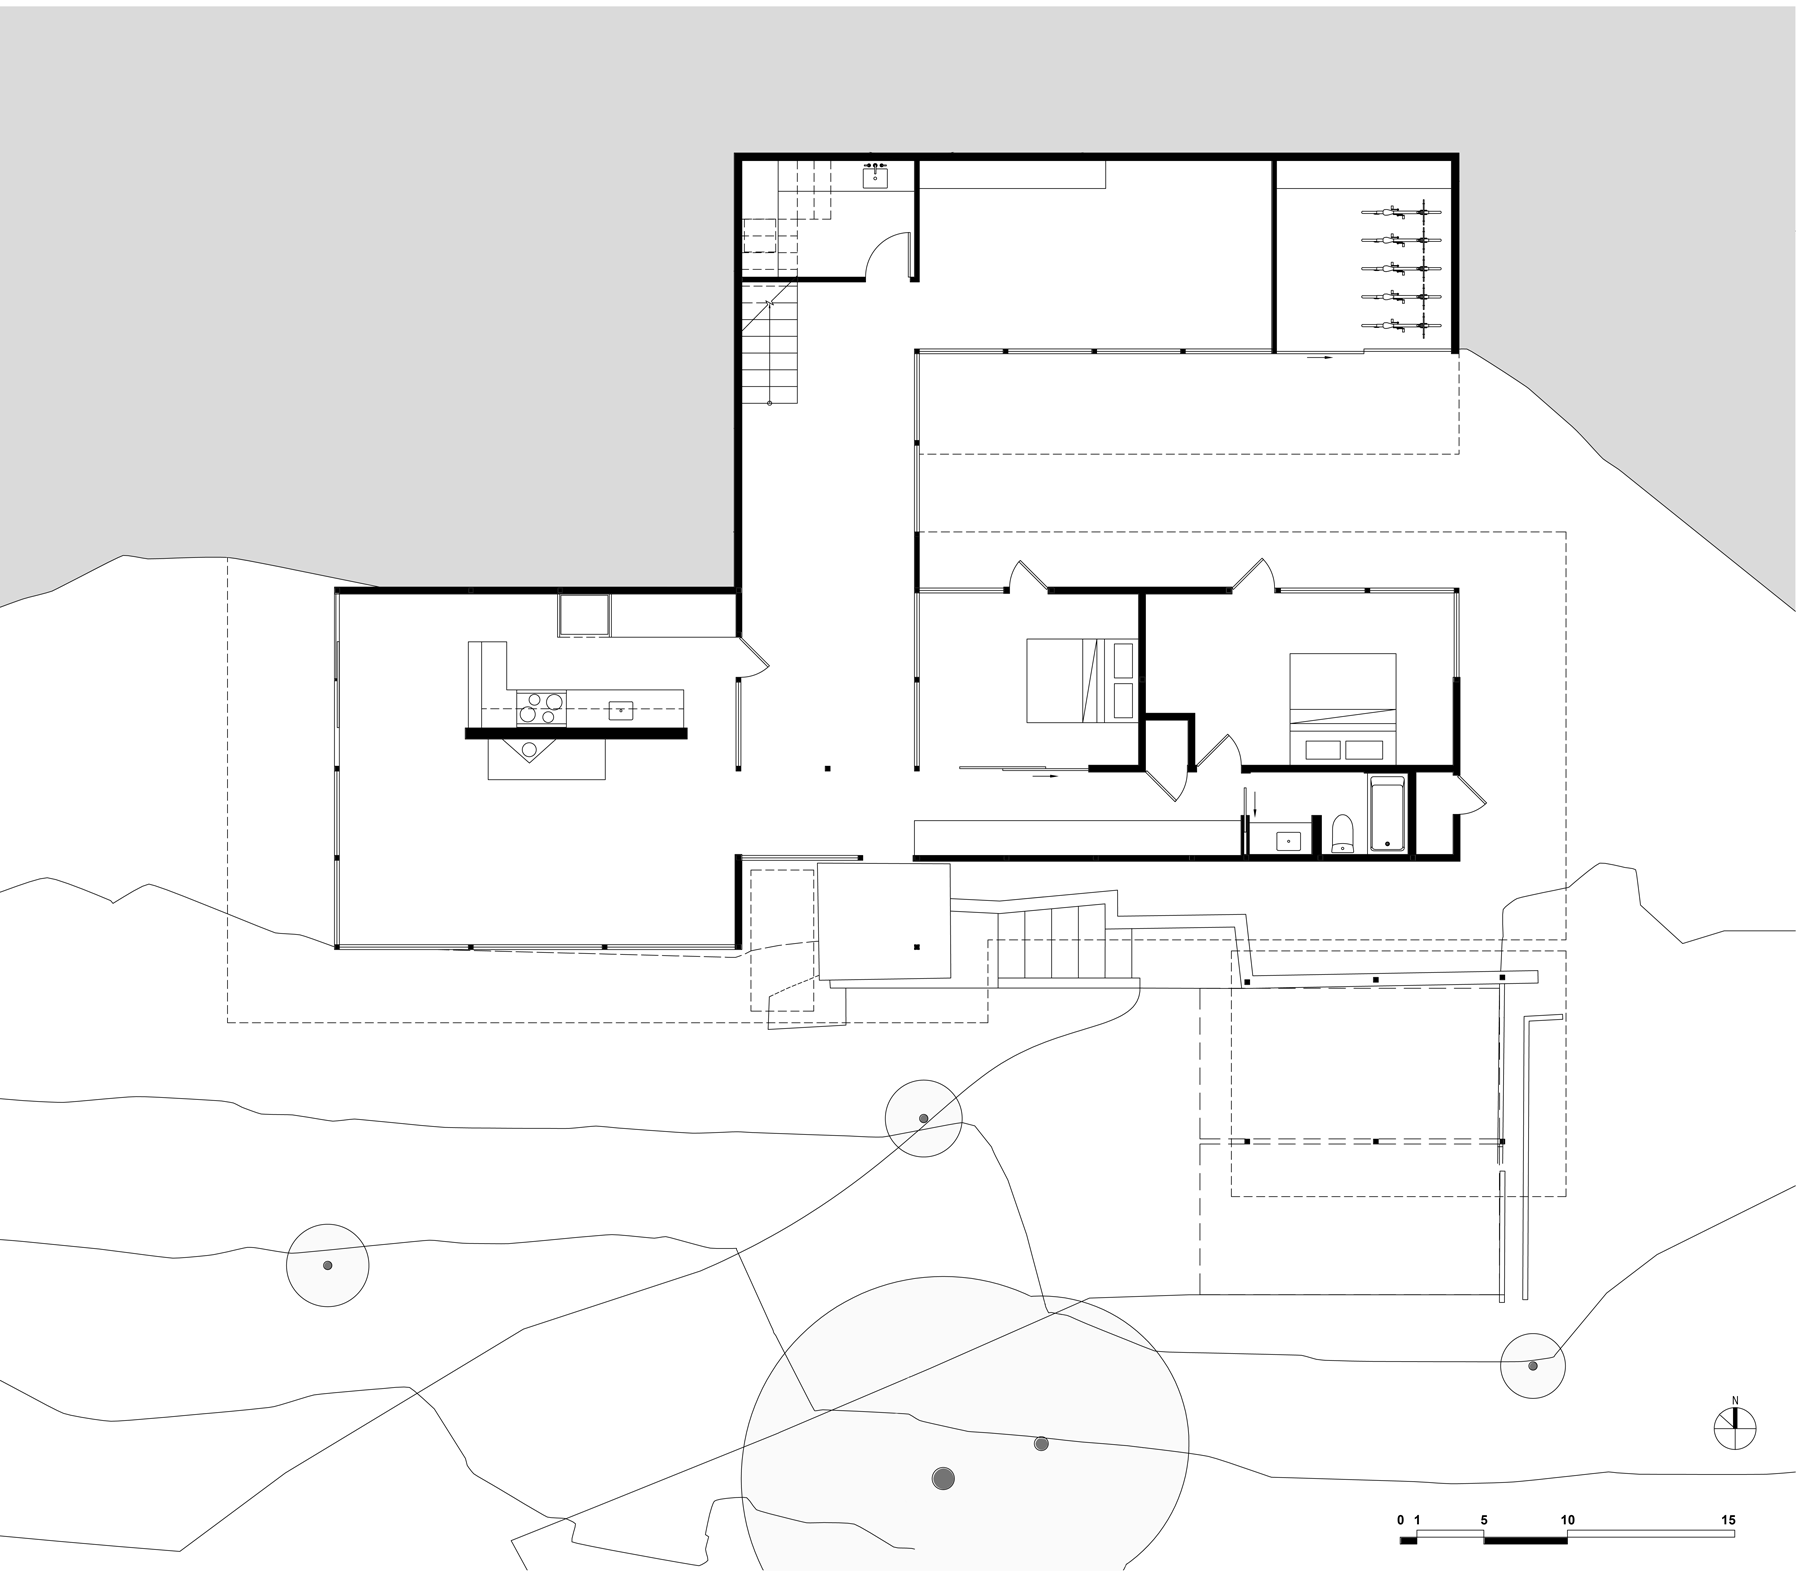 Plans-A2.png